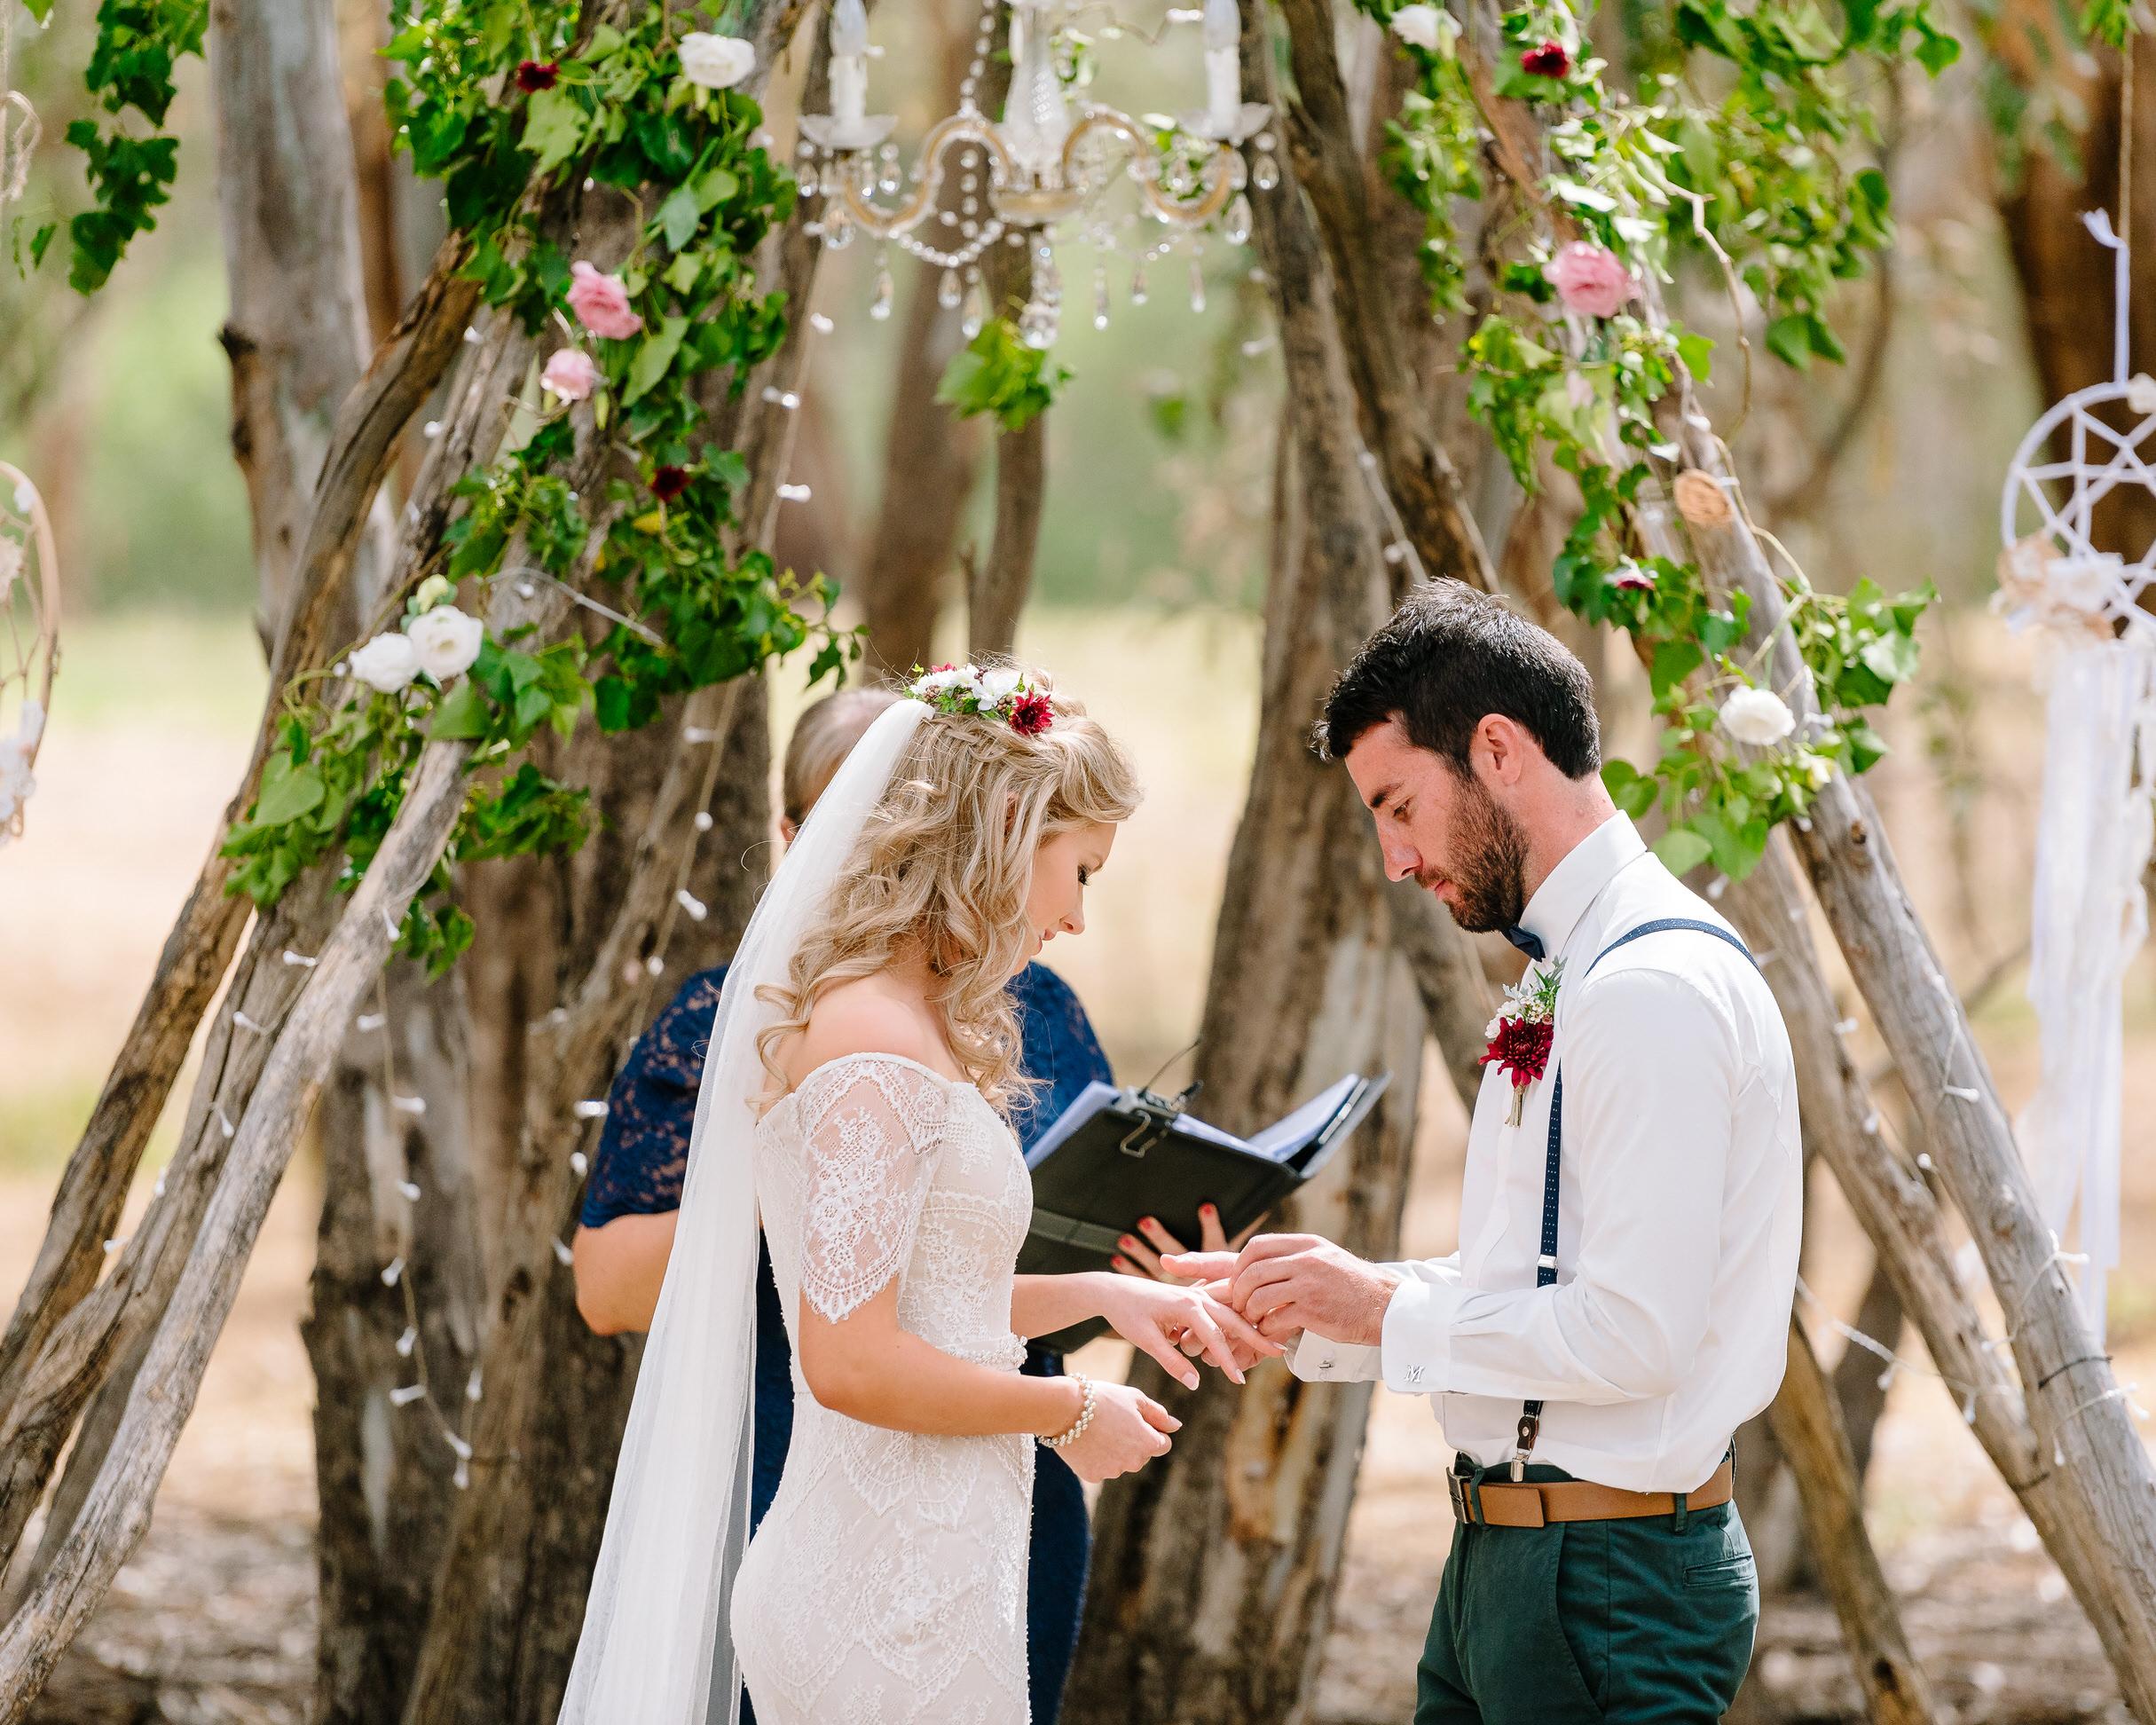 Justin_And_Jim_Photography_Backyard_Wedding176.JPG